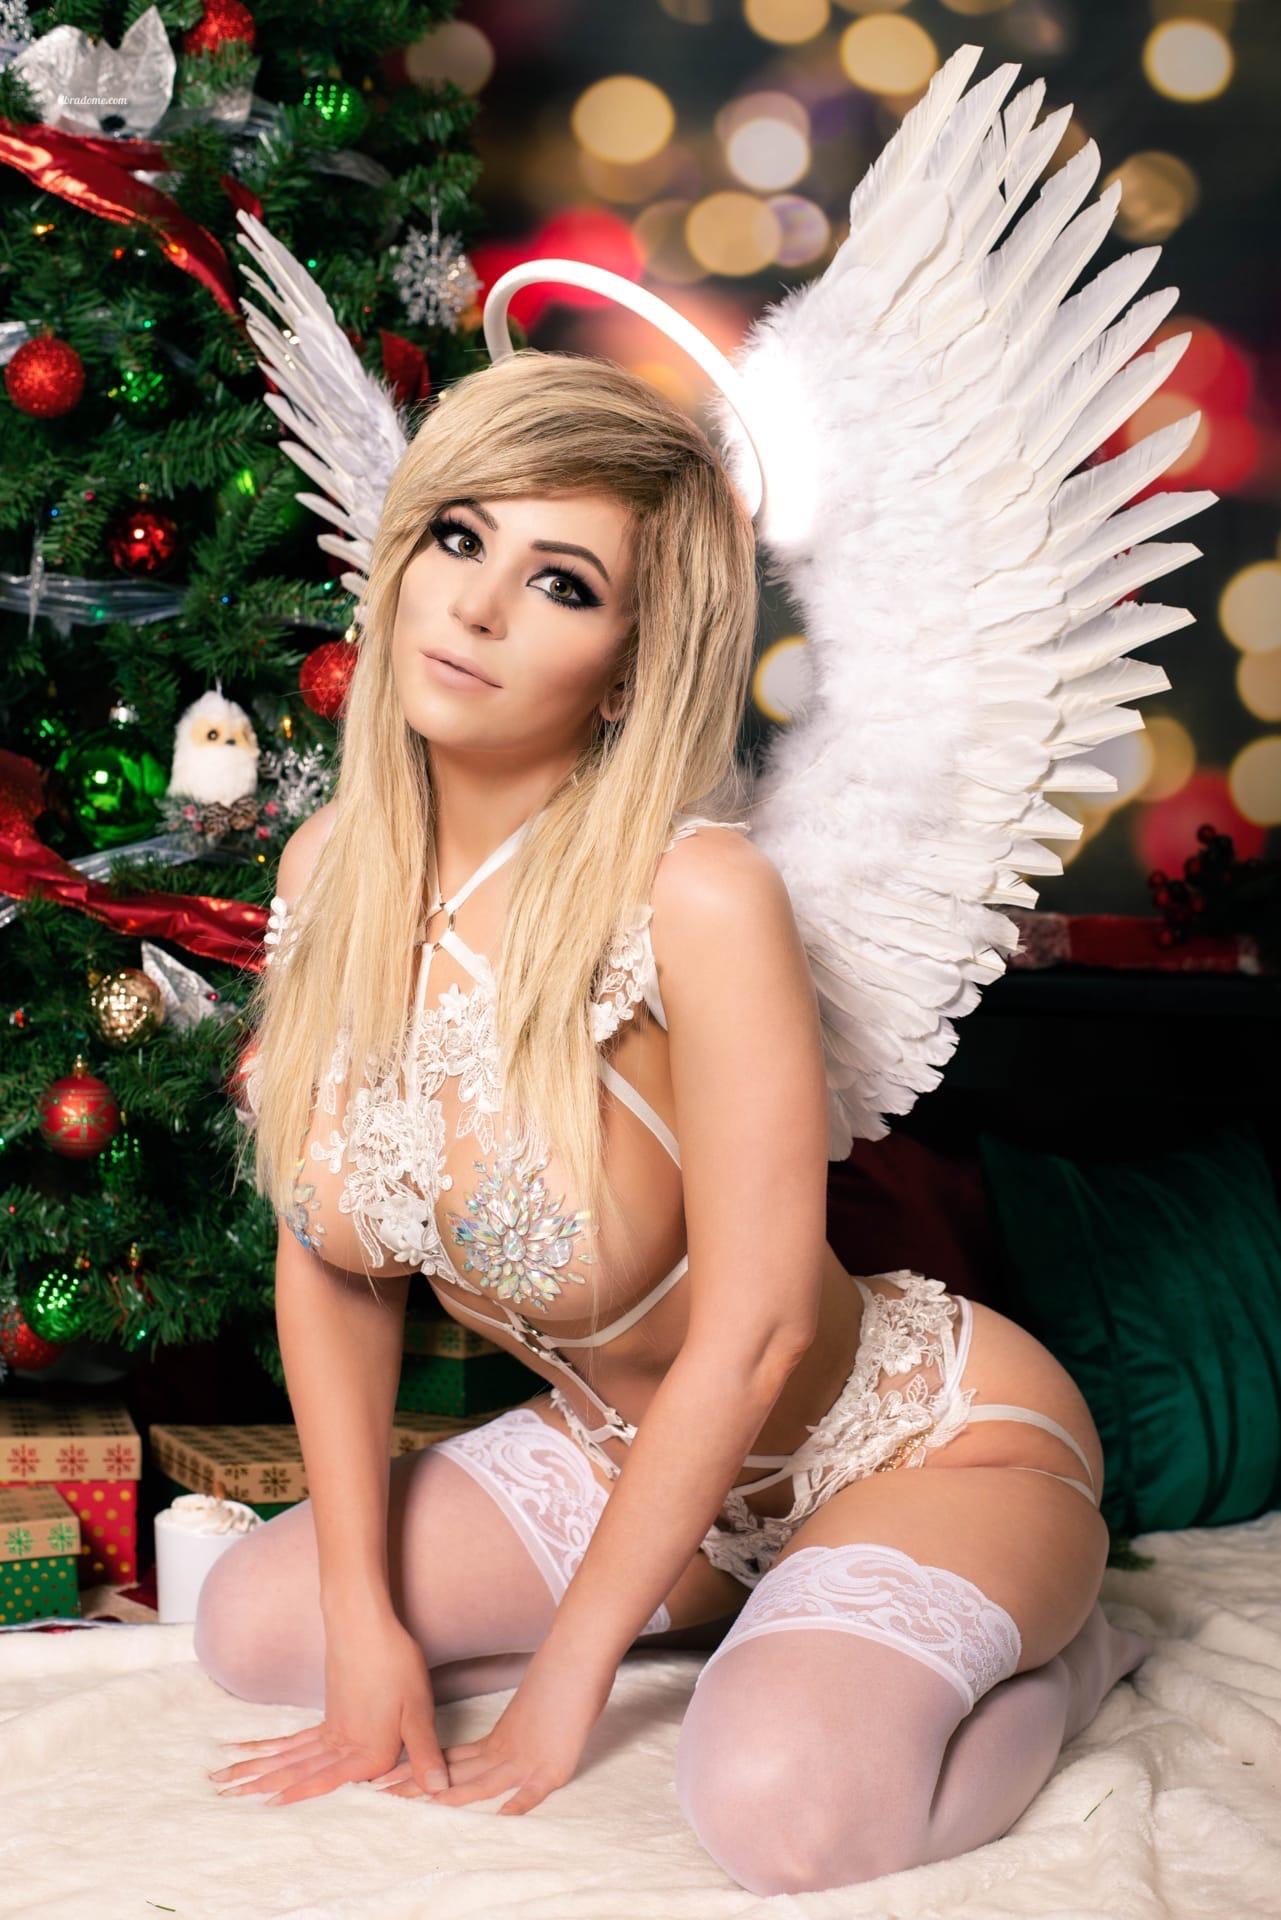 Angel patreon